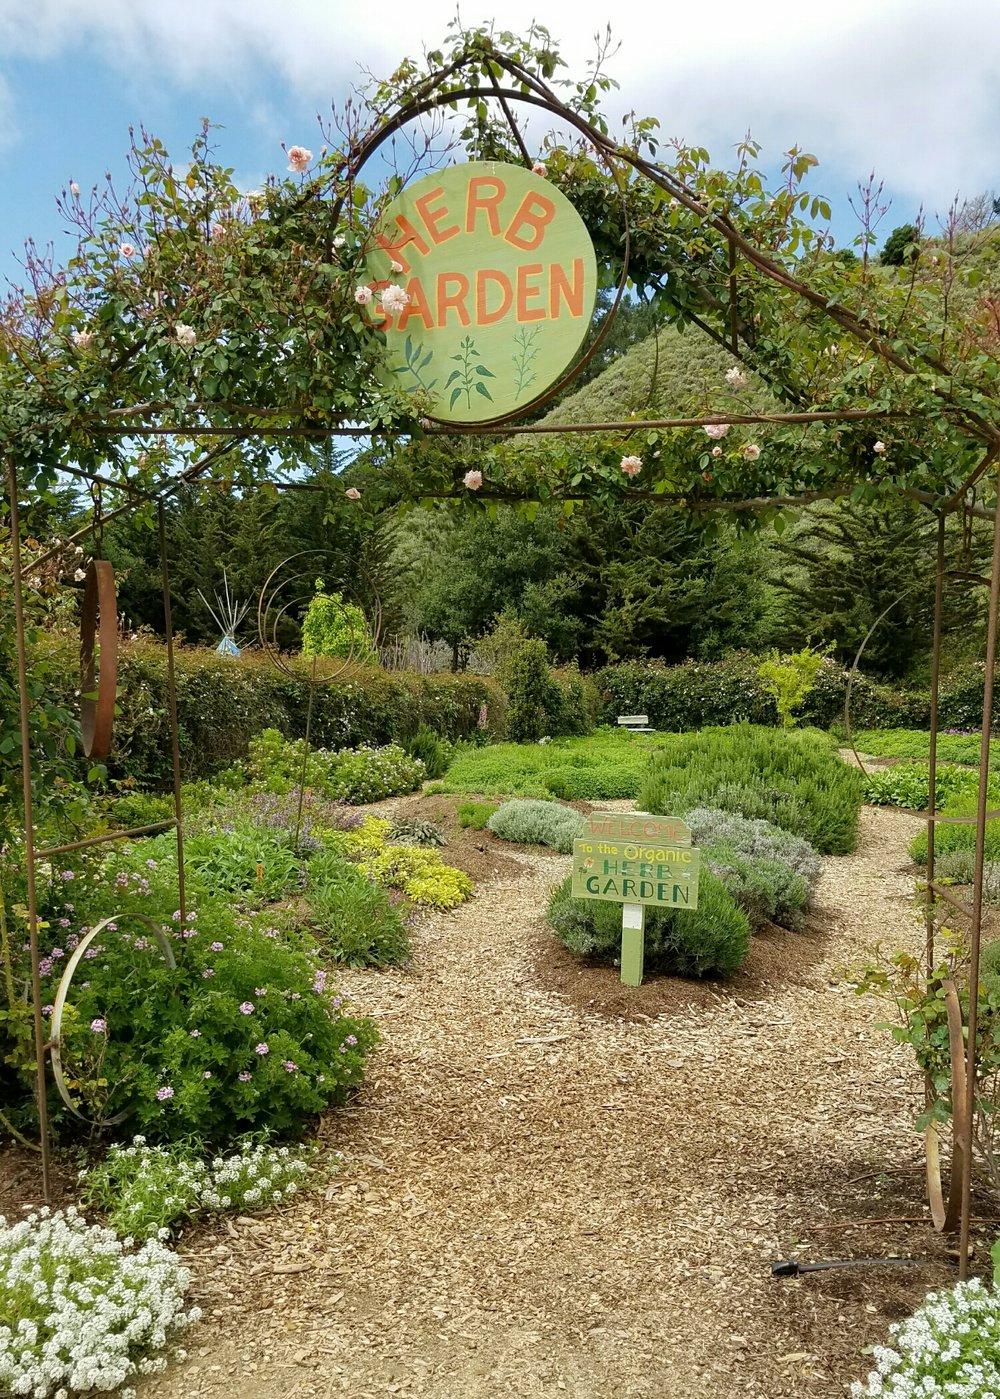 The Earthbound Farm's herb garden in Carmel Valley, CA